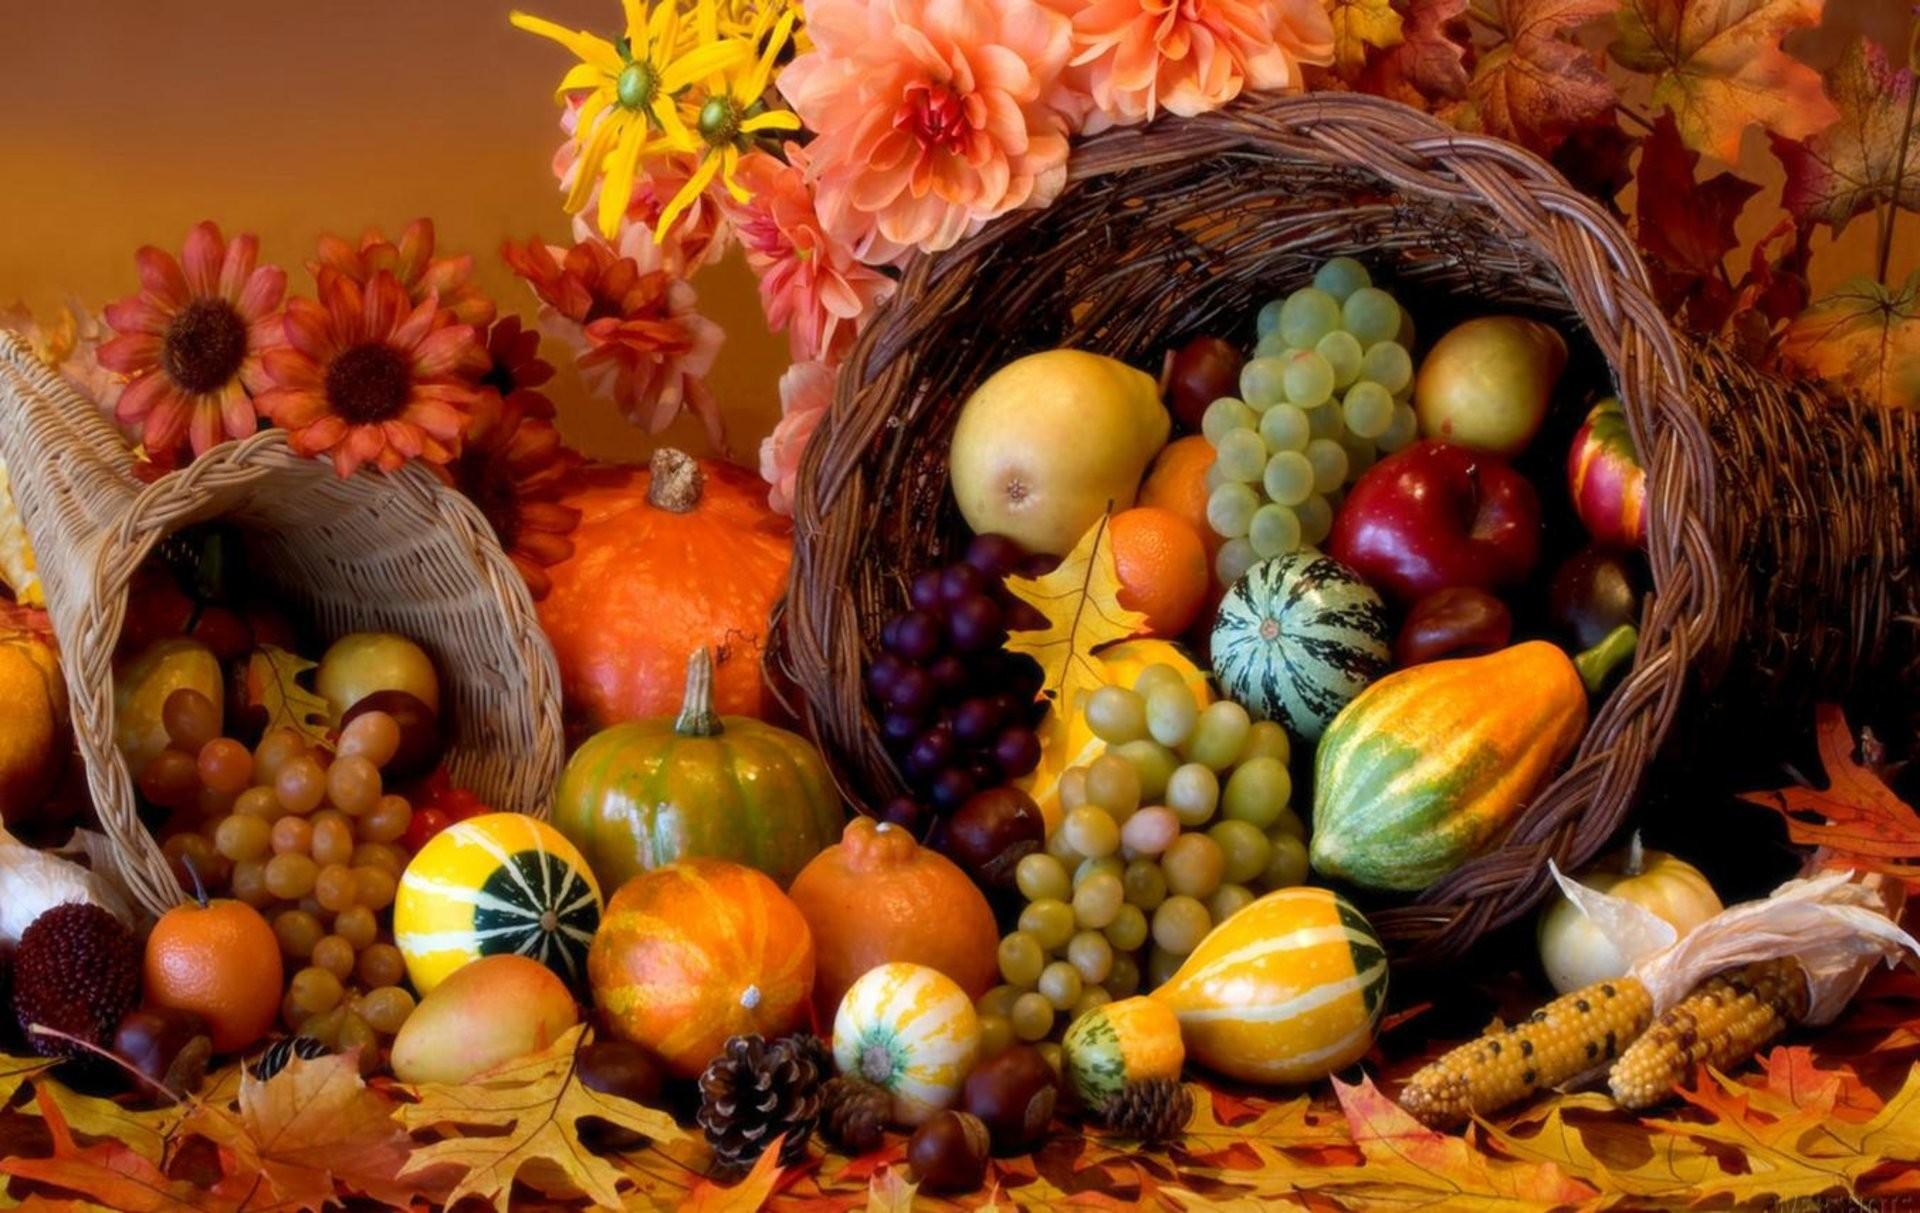 Thanksgiving Holiday Autumn Turkey Wallpaper - Happy Thanksgiving Cornucopia - HD Wallpaper